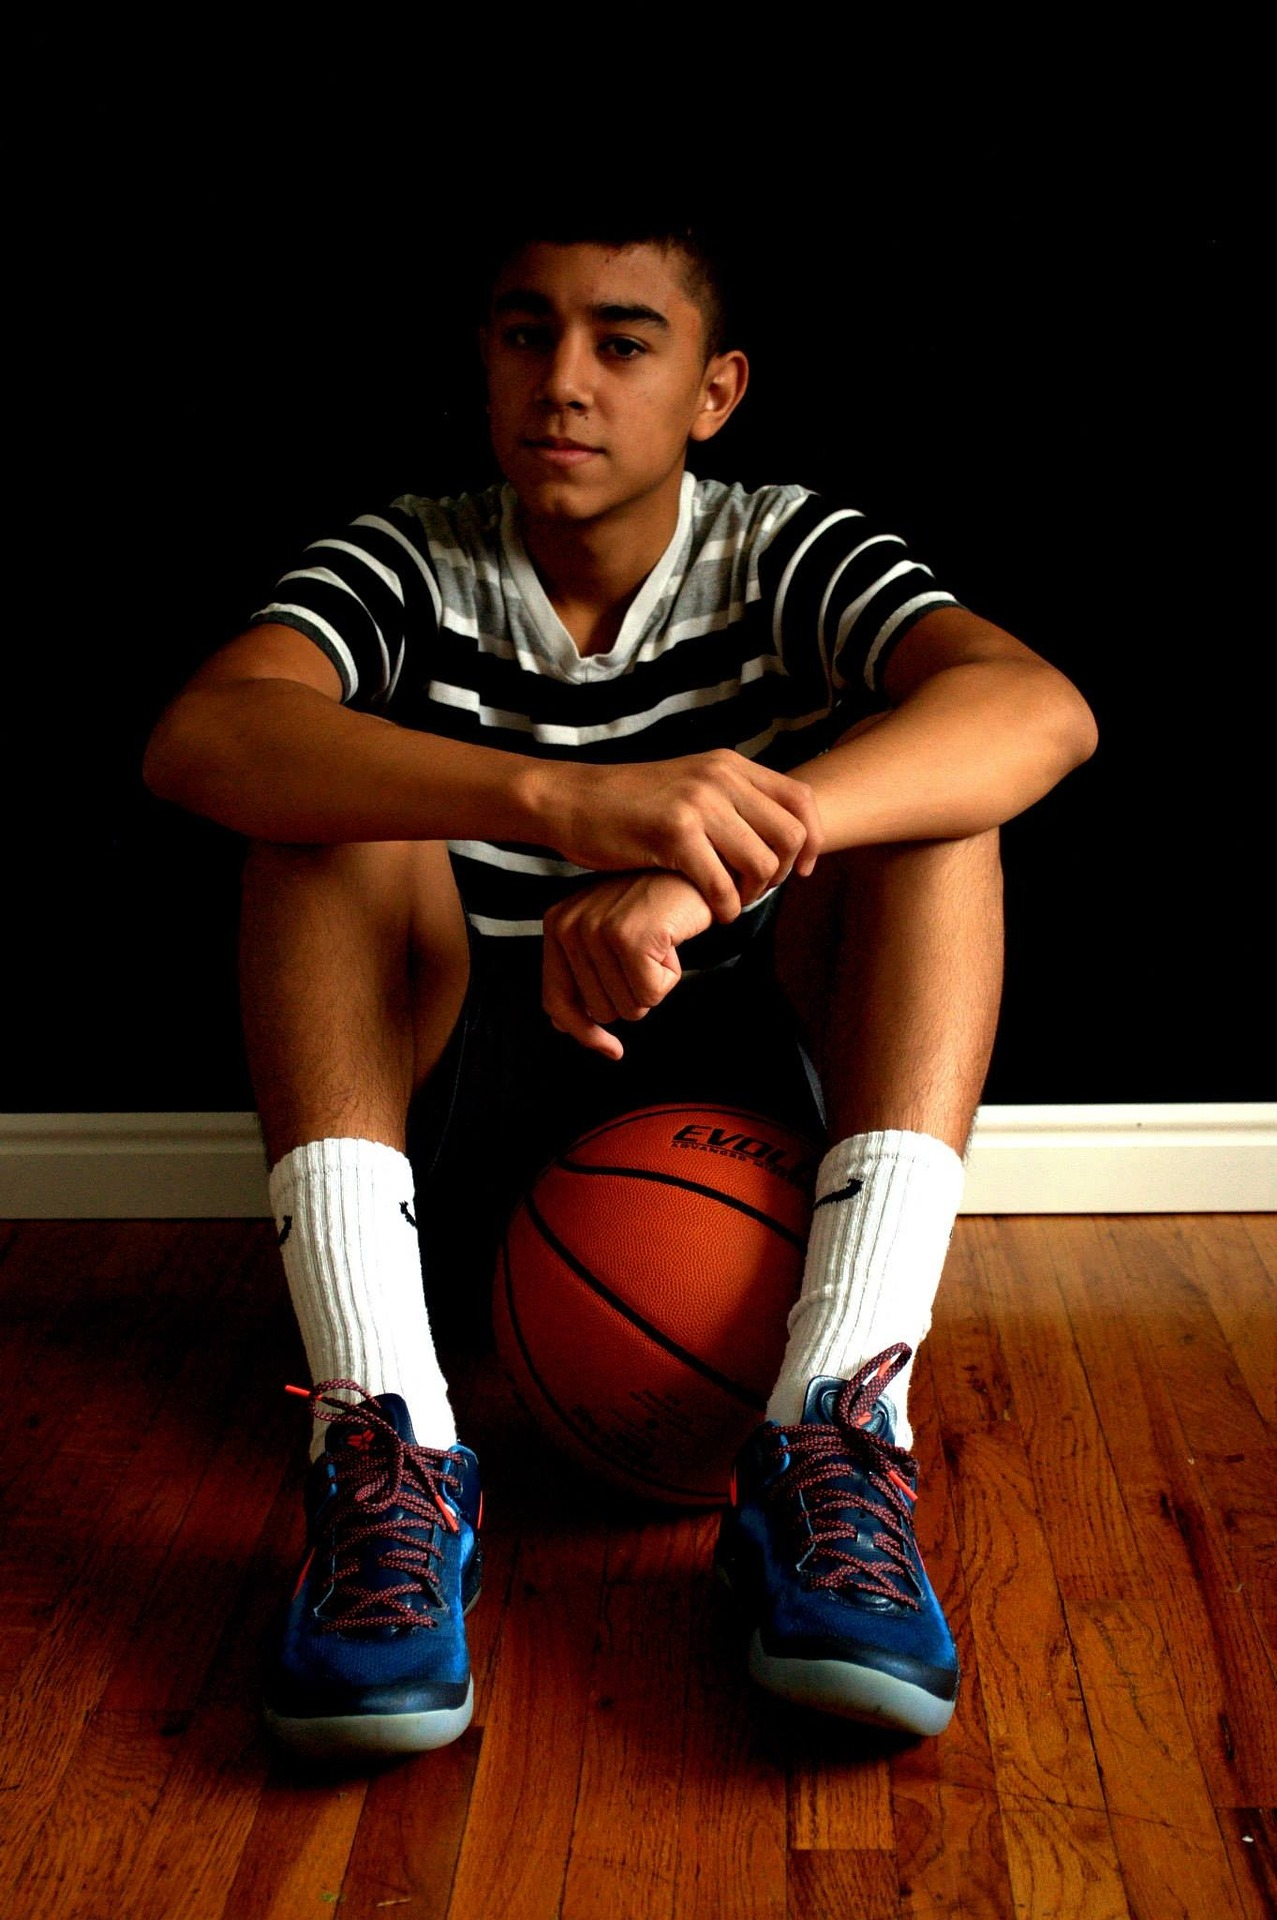 basketball-888530_1920.jpg